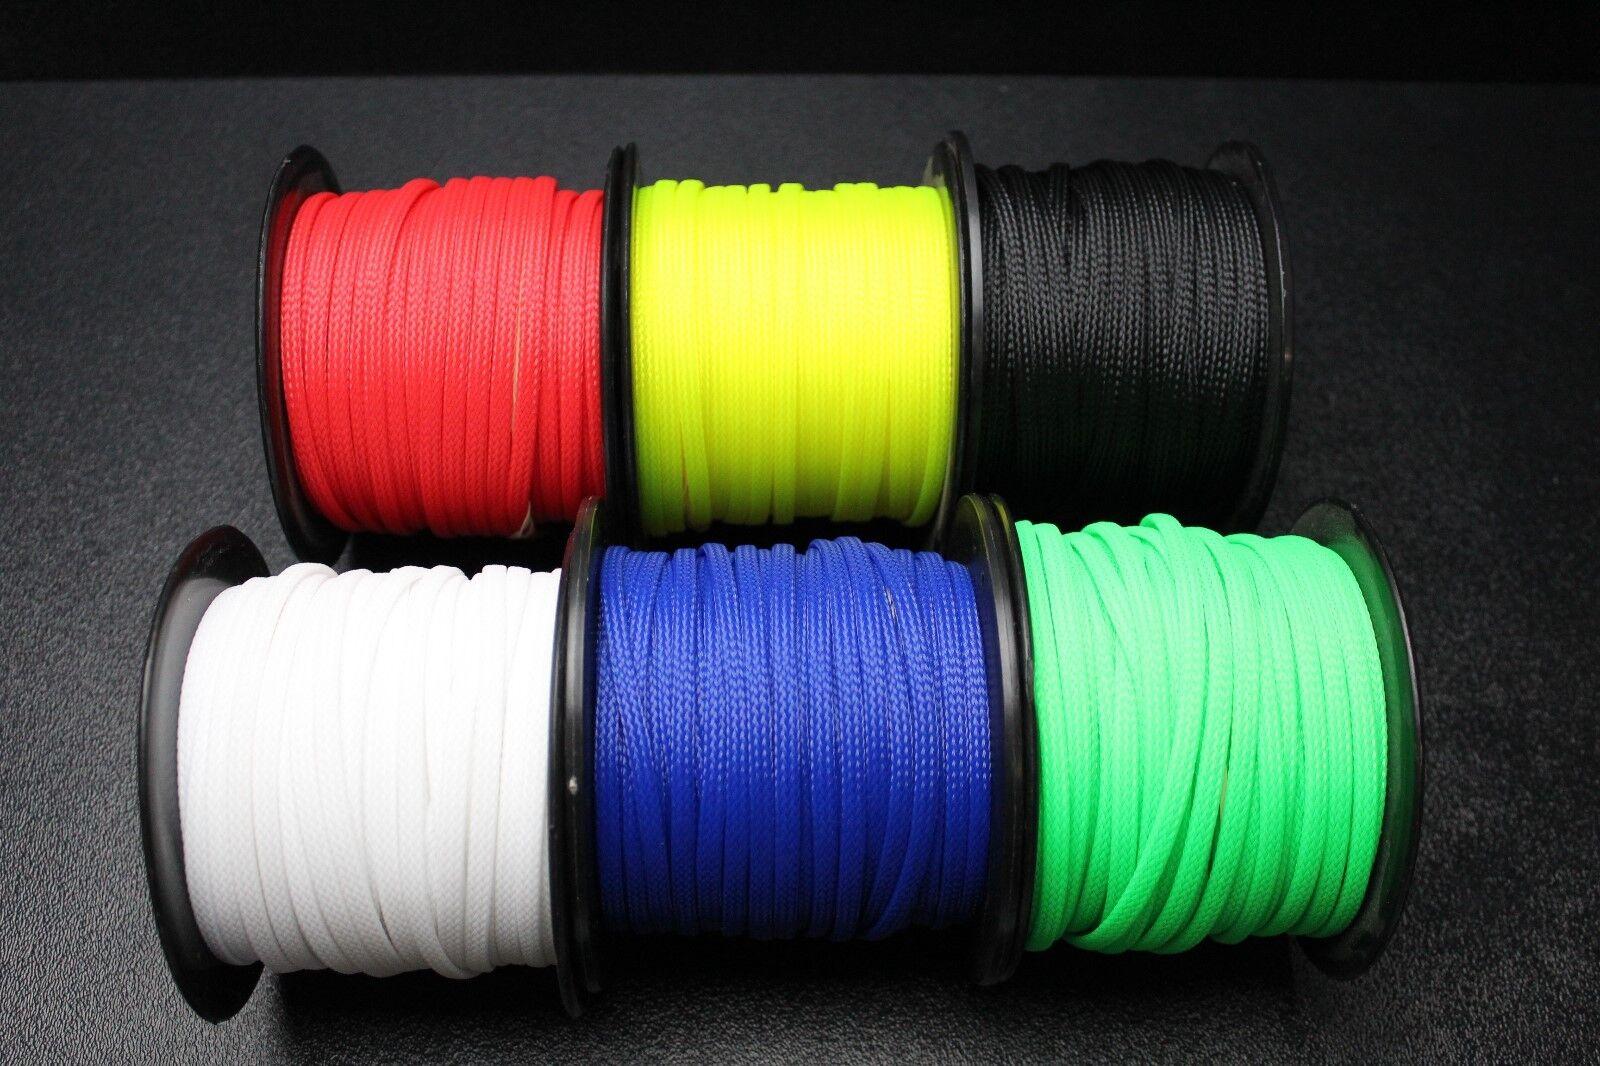 Braided cable sleeve toyota vios headlight